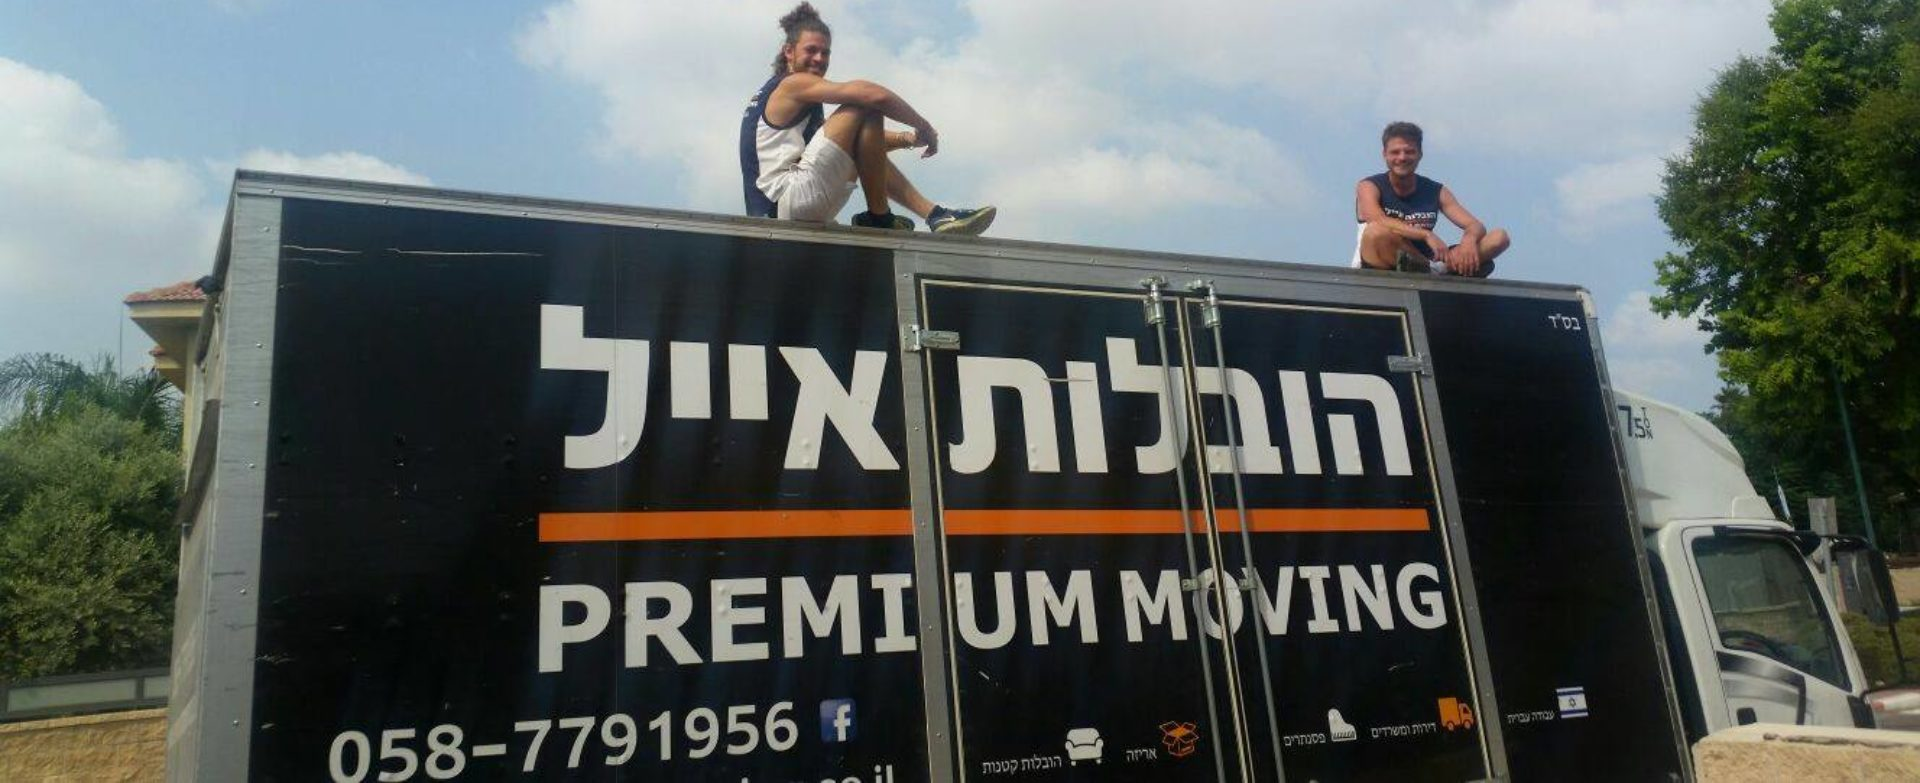 Premium Moving –  הובלות אייל